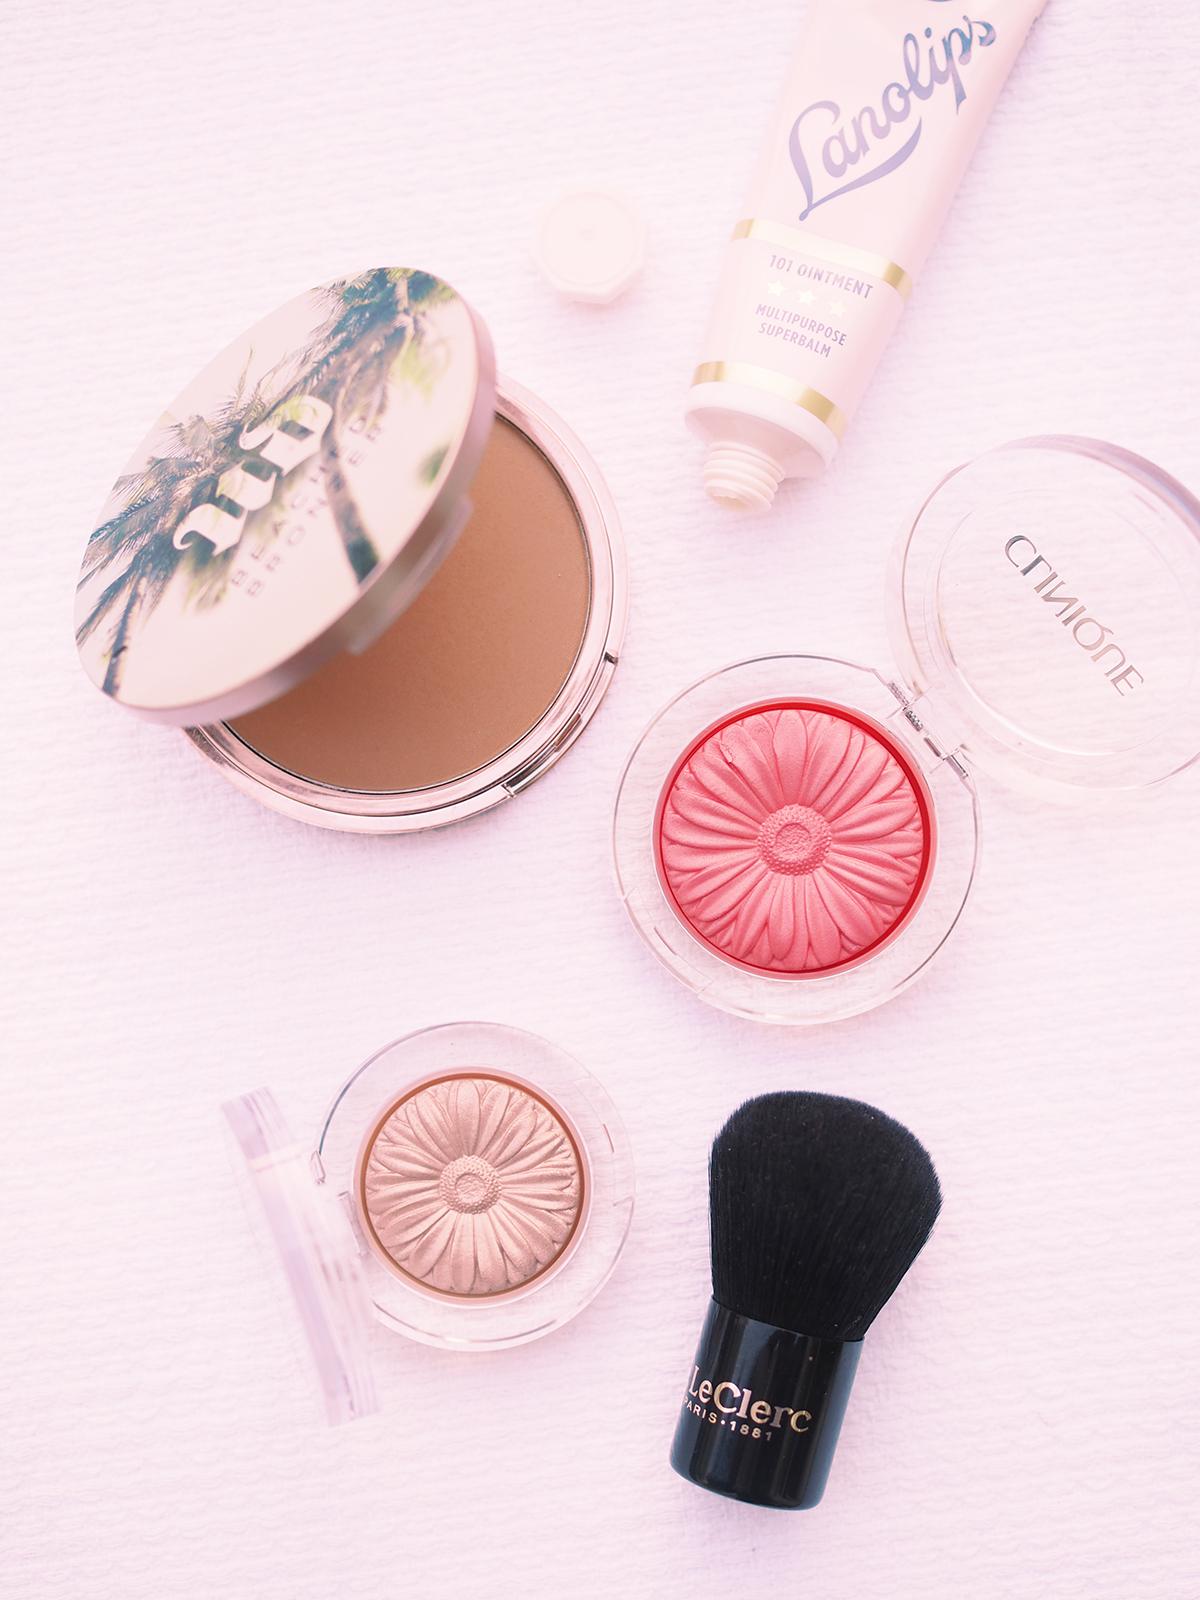 Beauty Favourites / Foxycheek